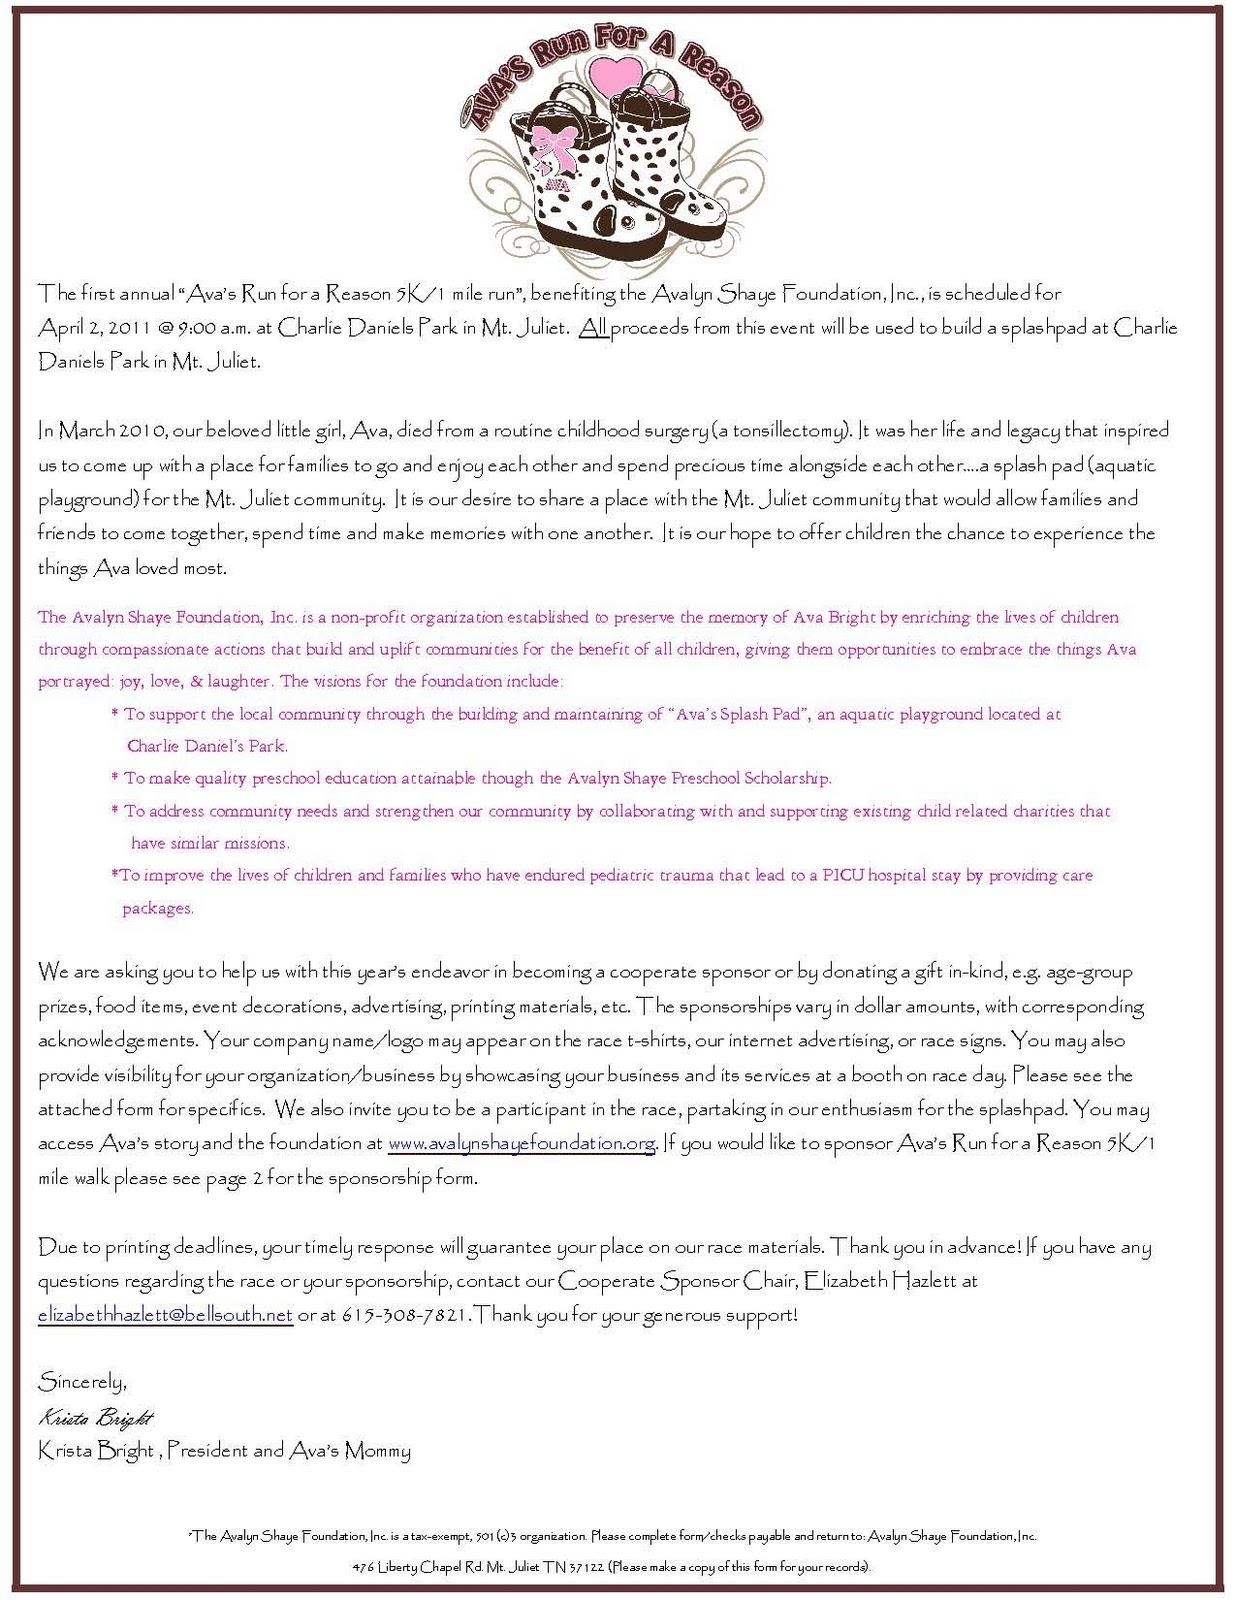 corporate sponsorship letter template sponsorship commitment form